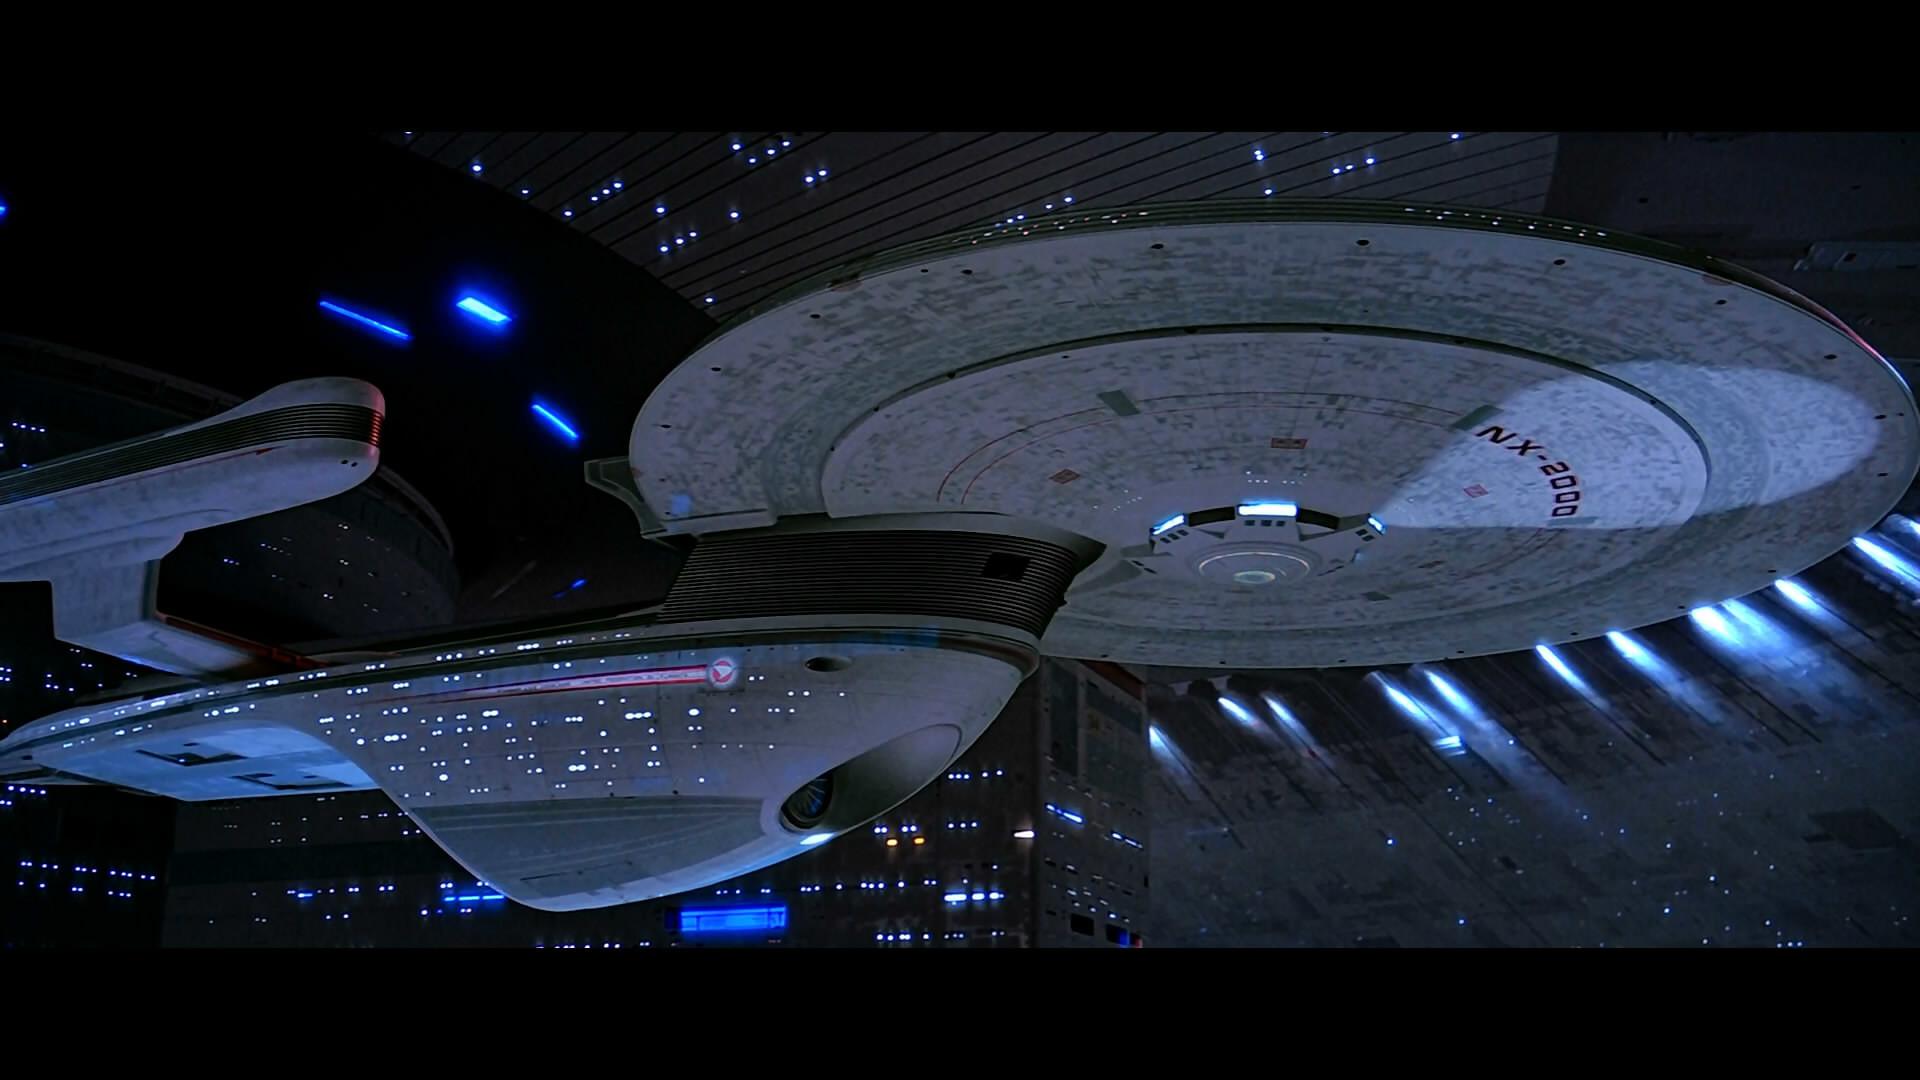 Excelsior-class starship engaged in battle.   Star Trek – Excelsior-Class  United Federation of Planets Starships   Pinterest   Trek and Star trek